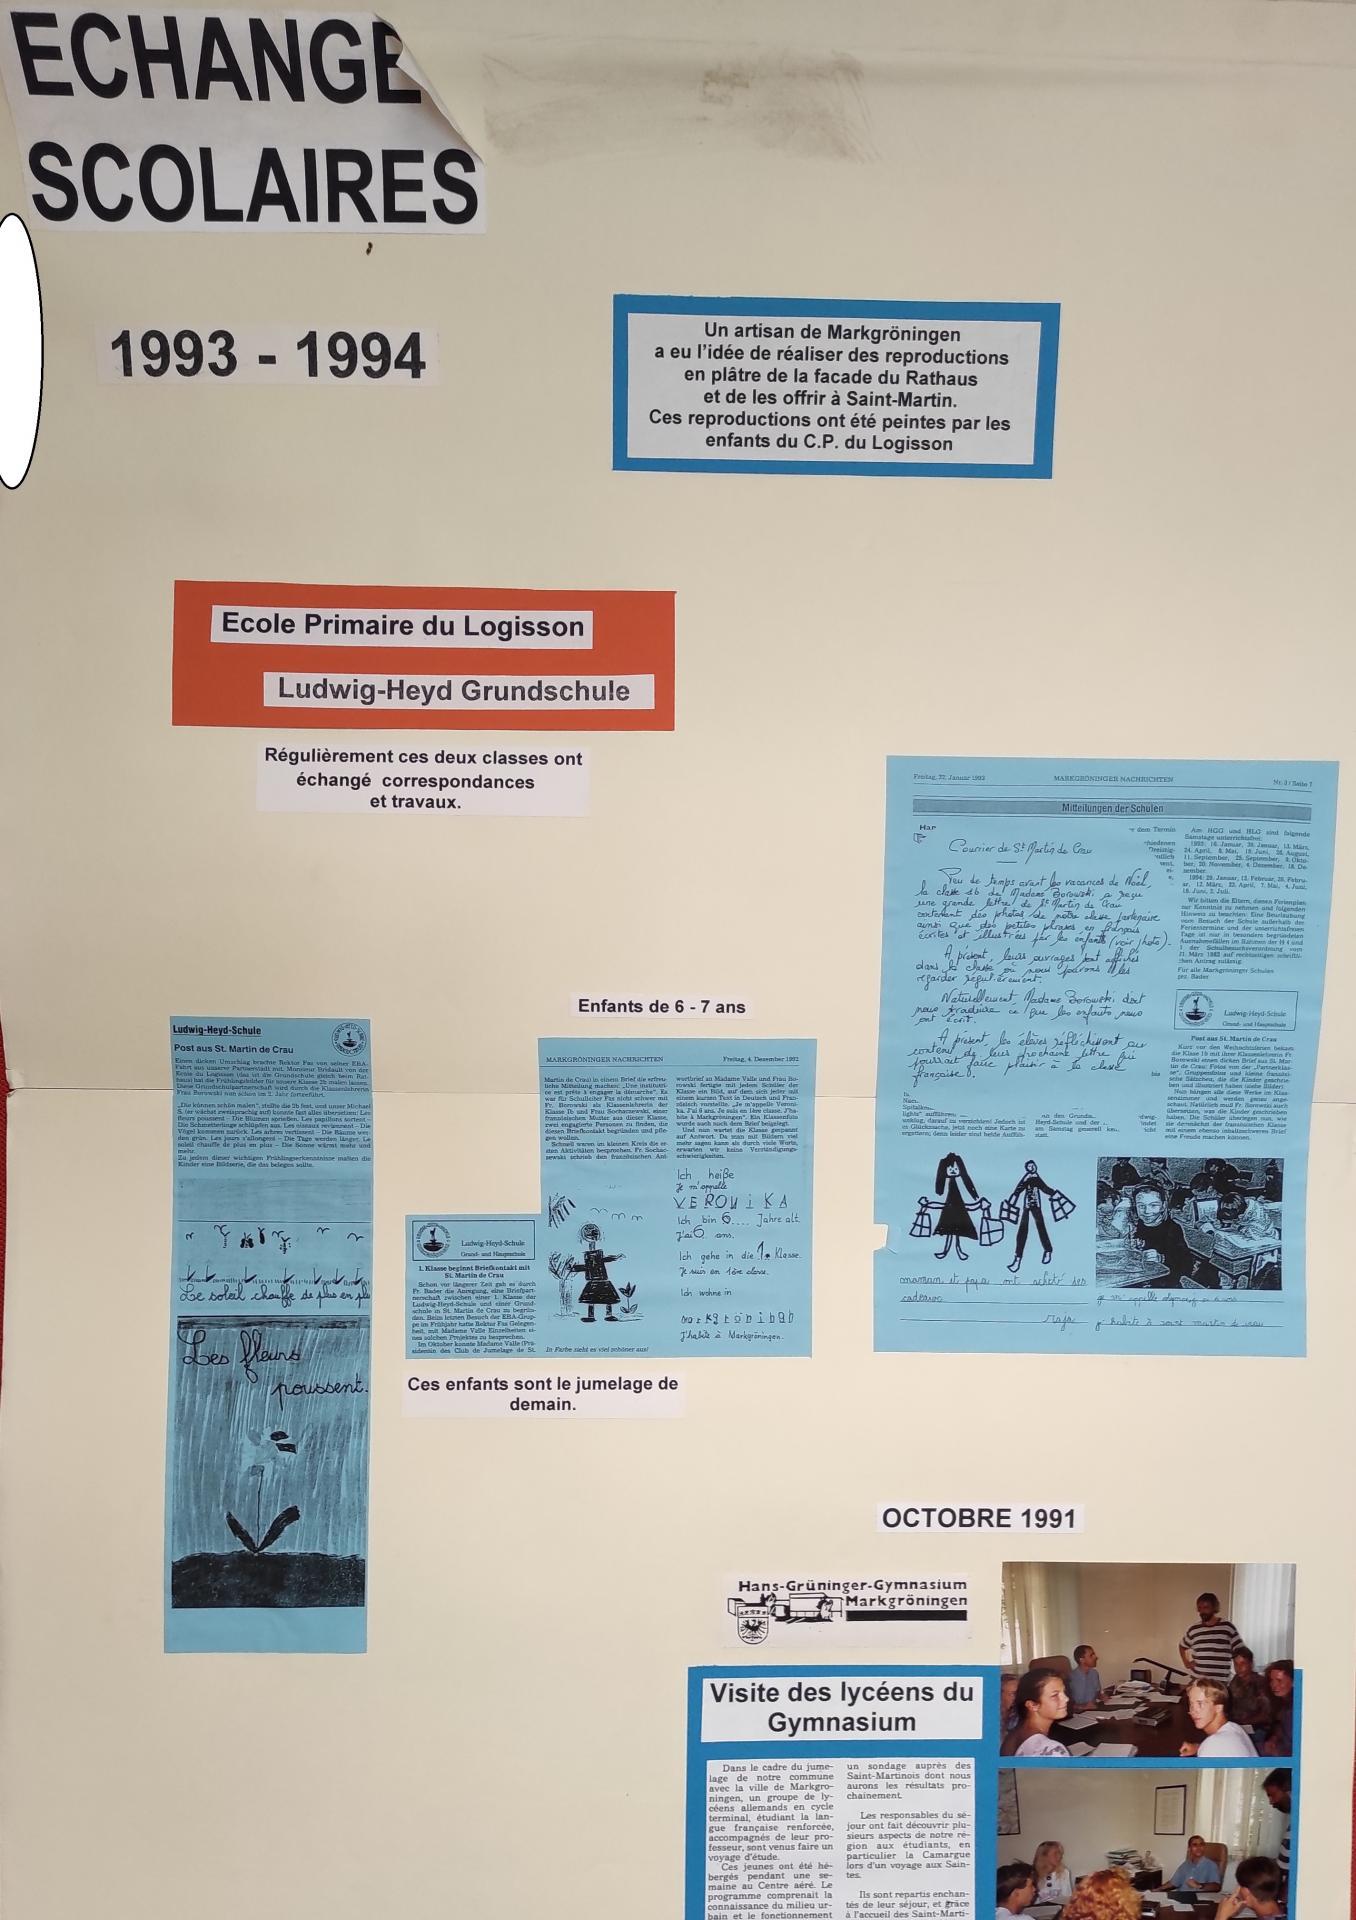 1993 1994 echanges scolaires